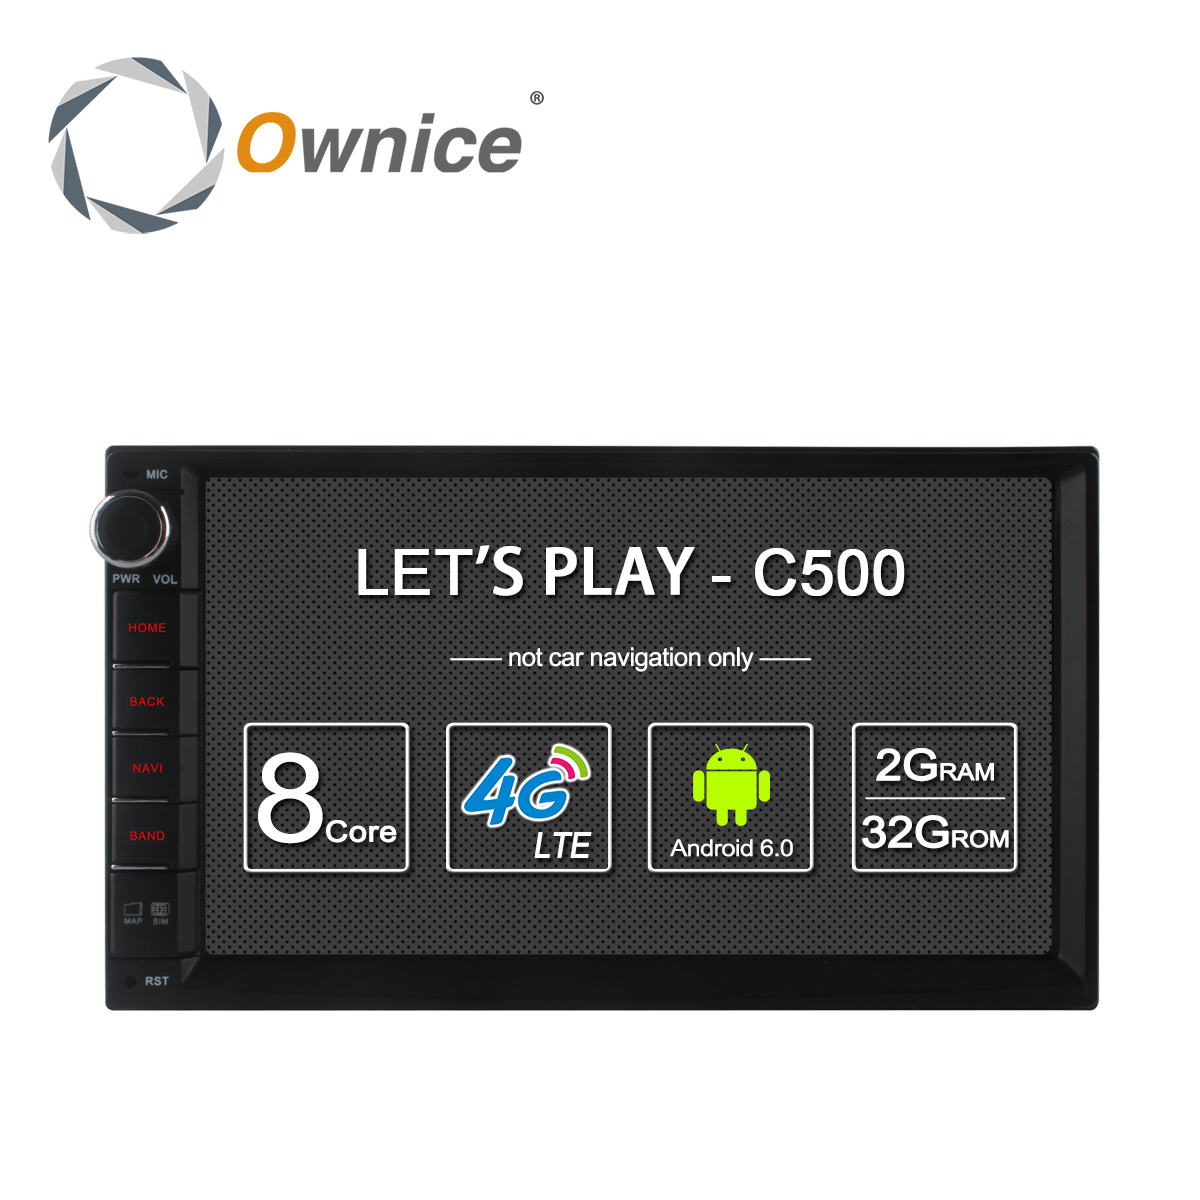 Ownice C500  Android 6.0 Octa Core 2 din Universal For Nissan GPS Navi BT Radio Stereo Audio Player(No DVD) Build-in 4G Moudule автомобильный dvd плеер joyous kd 7 800 480 2 din 4 4 gps navi toyota rav4 4 4 dvd dual core rds wifi 3g